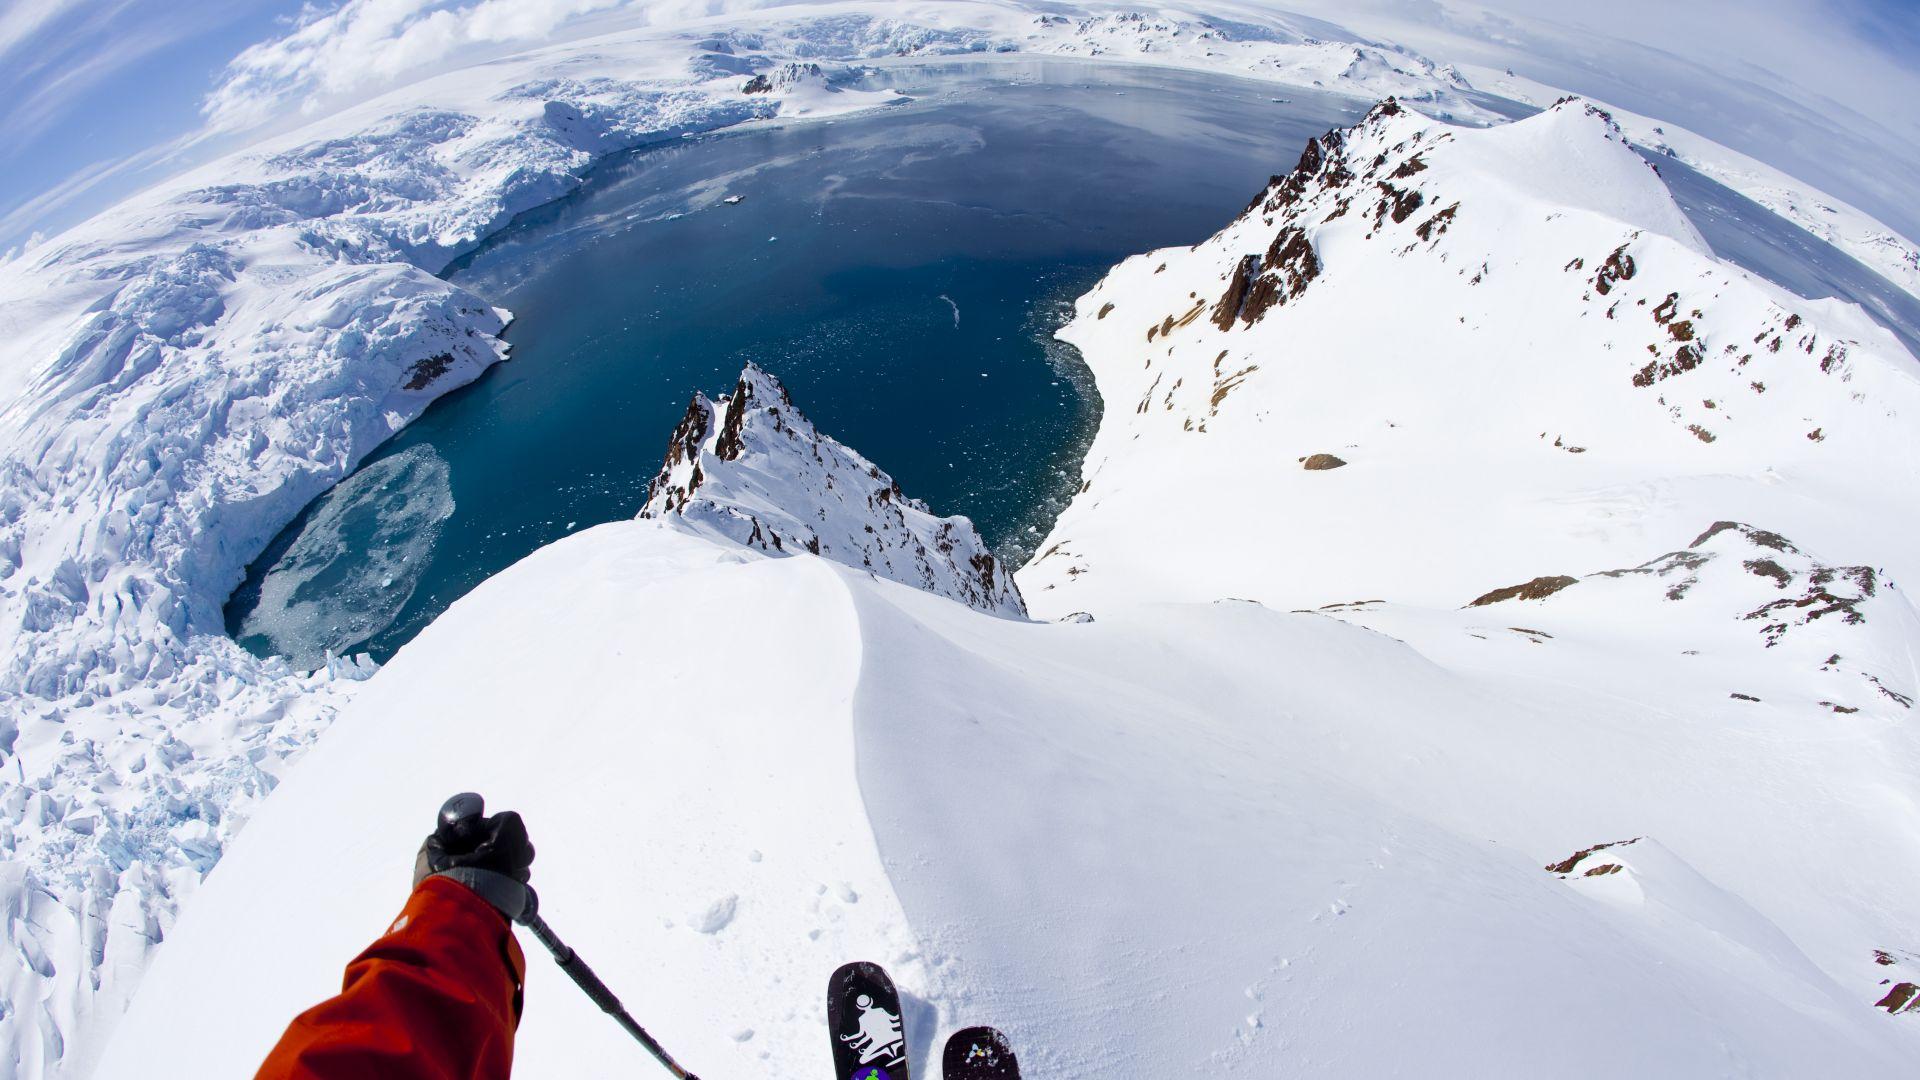 wallpaper antarctica, 5k, 4k wallpaper, 8k, skiing, travel, tourism